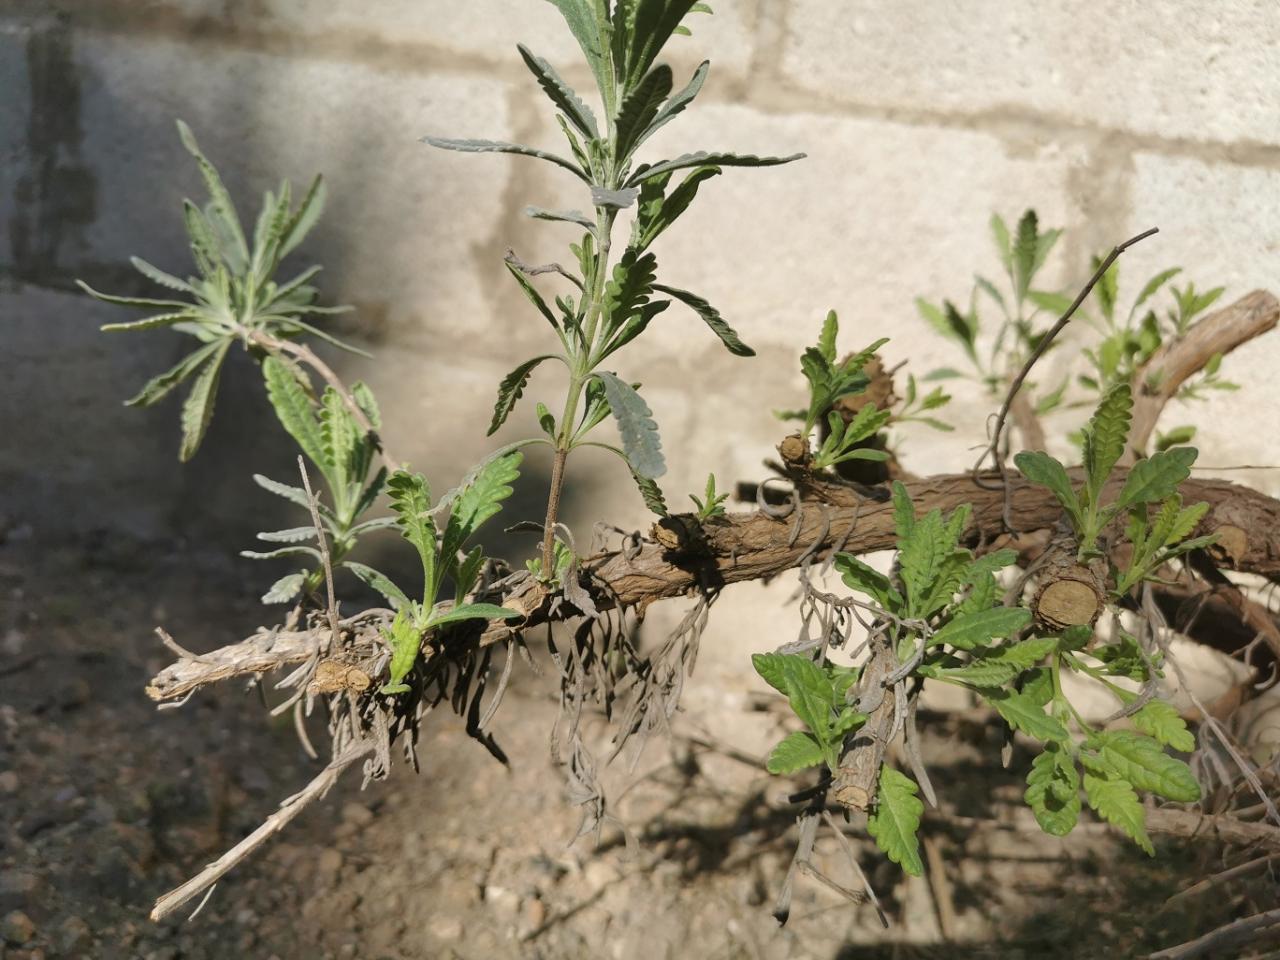 Pruned lavender cut back to the hard wood a few weeks ago